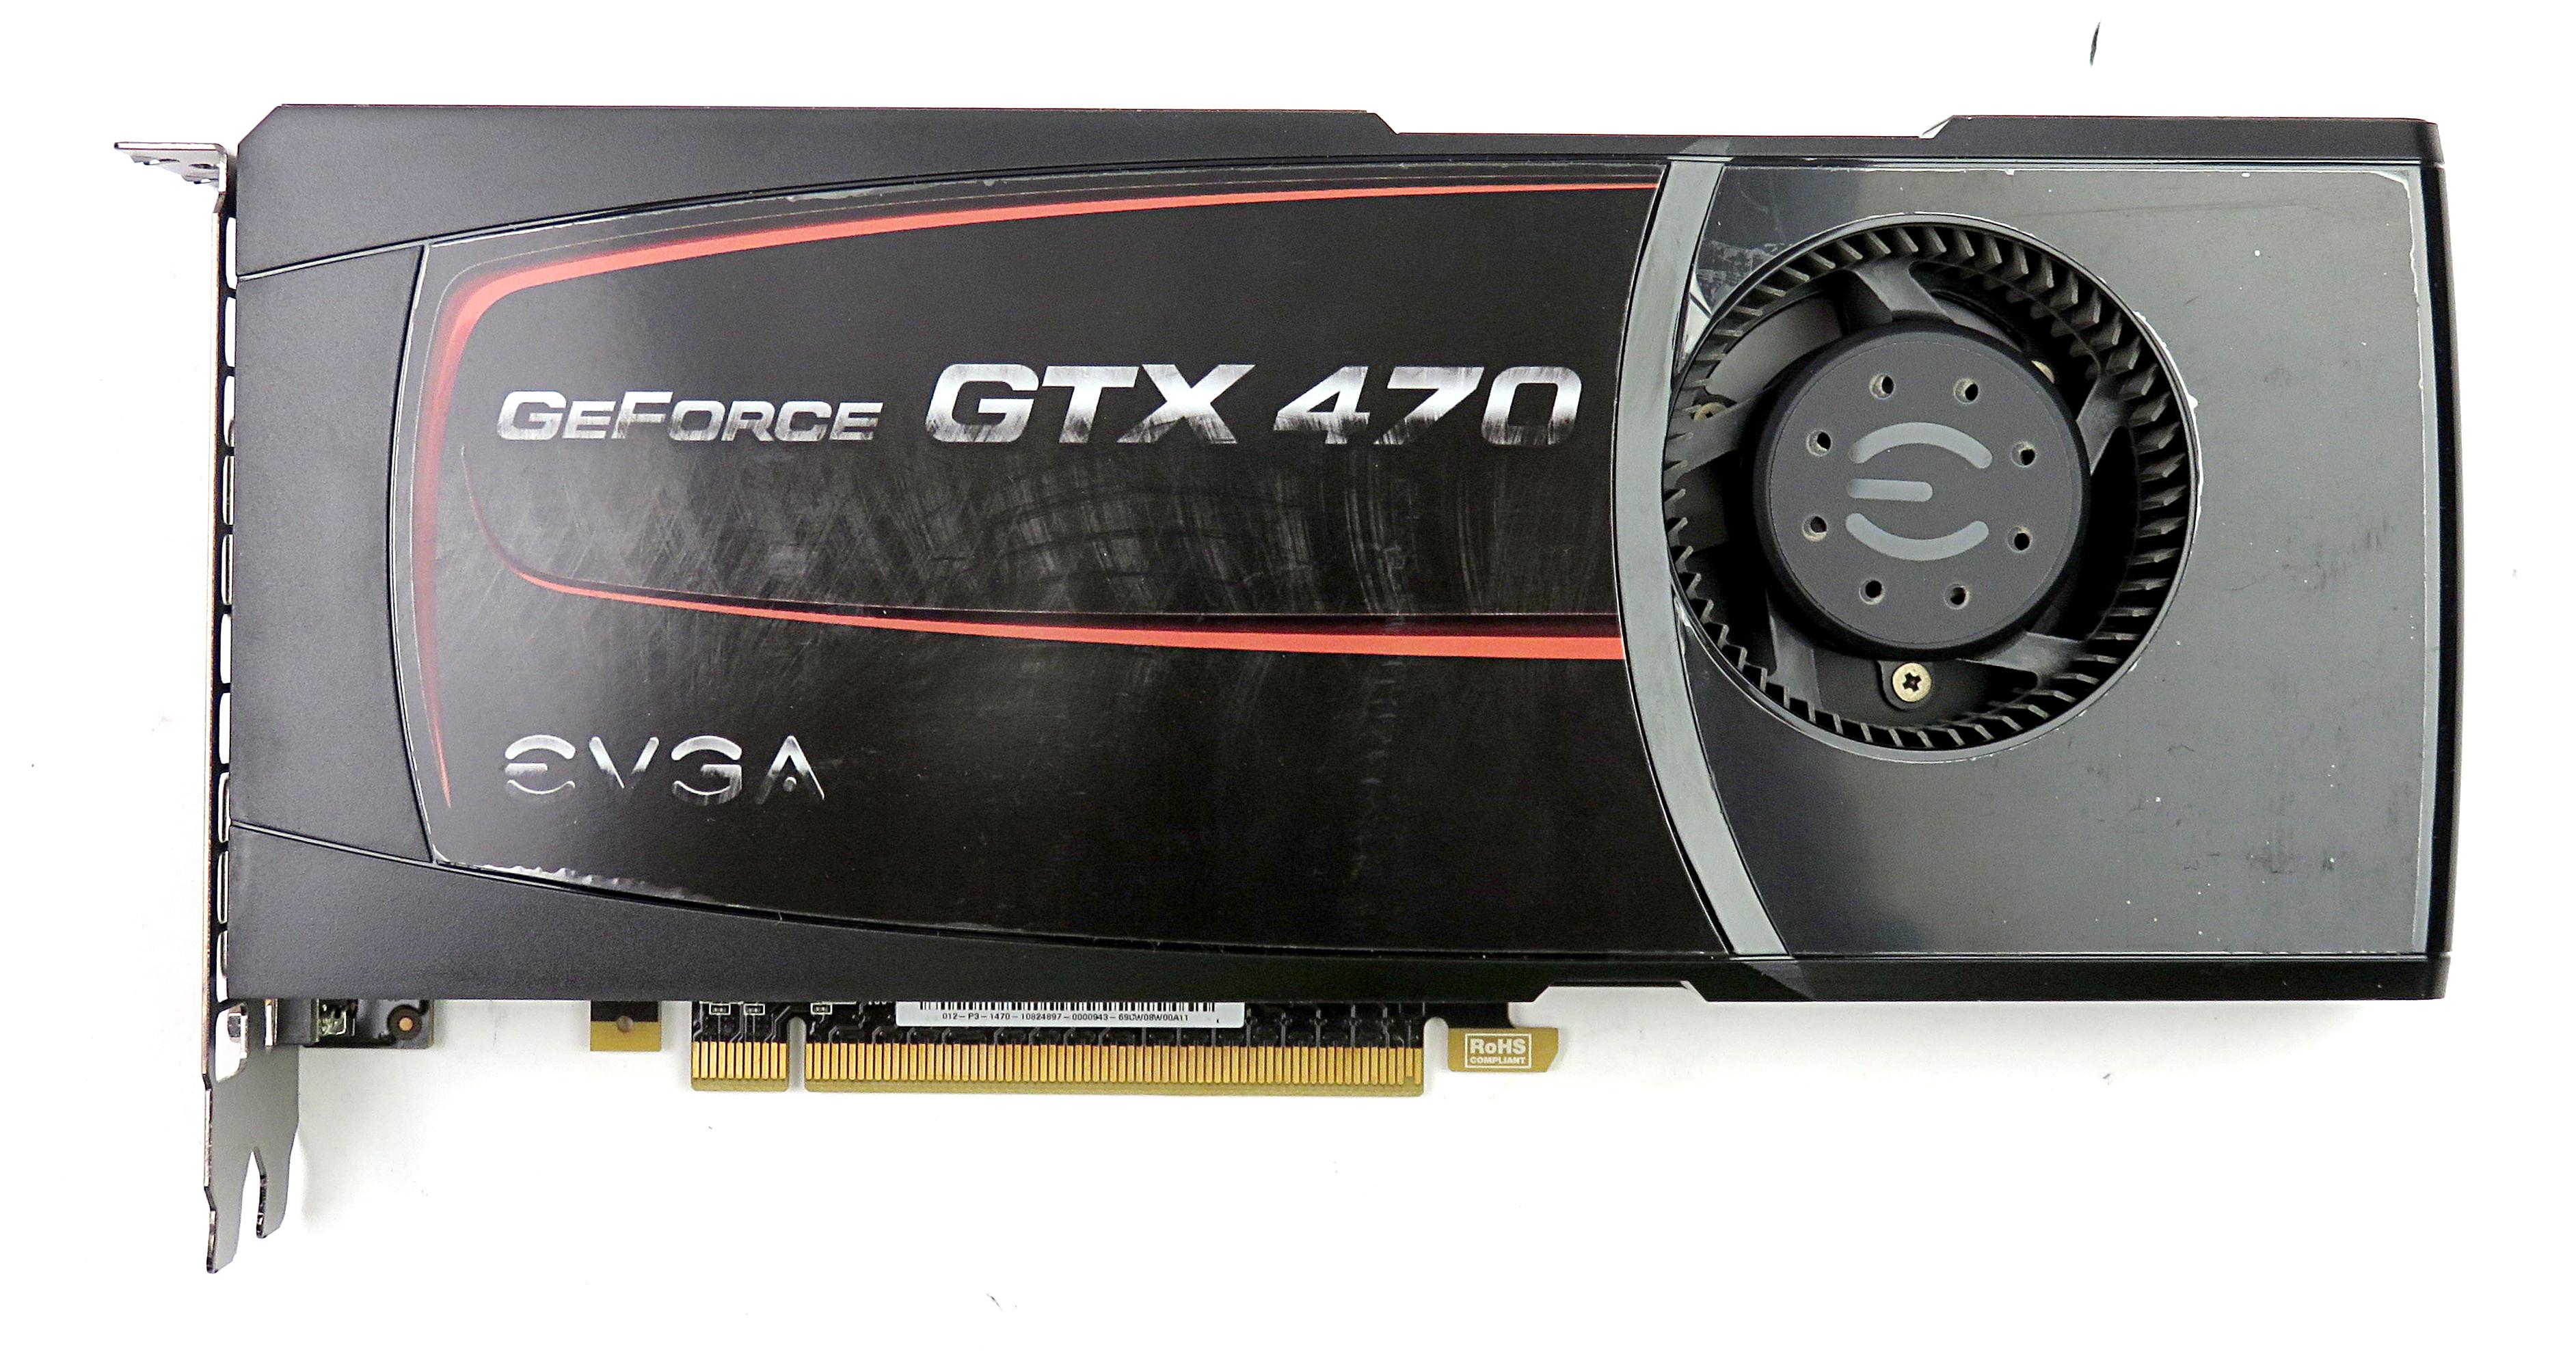 EVGA nVidia GTX 470 1280MB GDDR5 Graphics Card 012-P3-1470-ER mHDMI/2xDVI